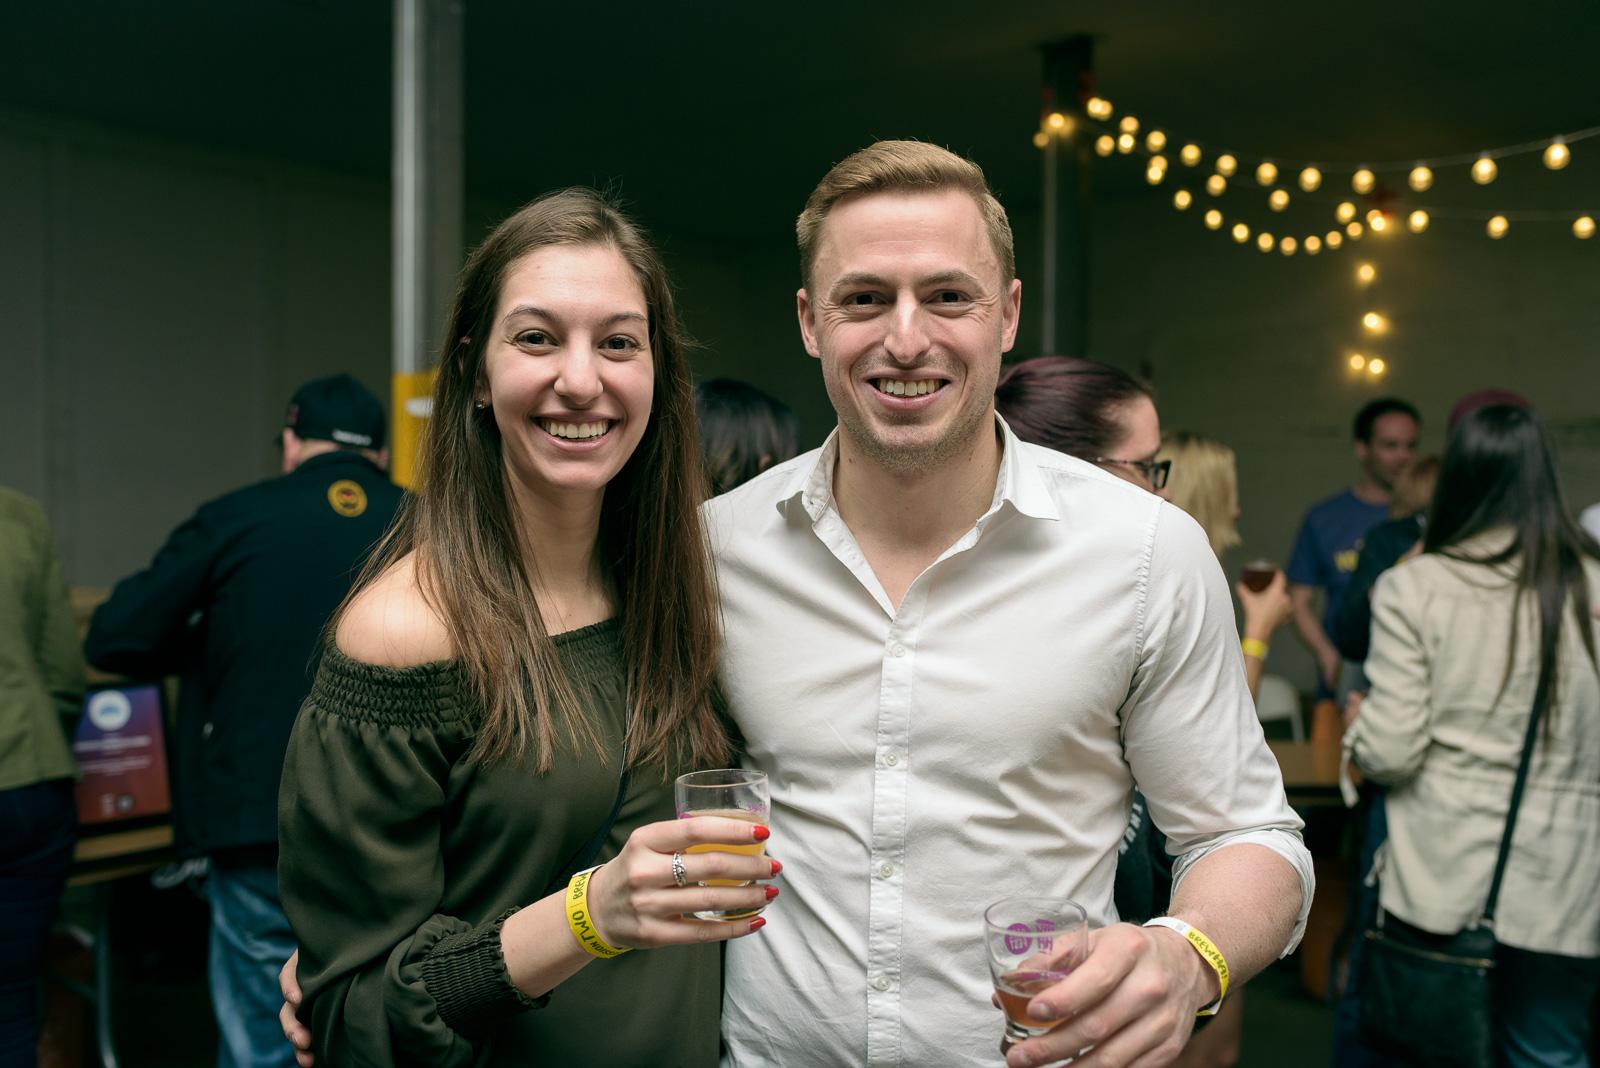 brewha-caskfest-blog-29.jpg